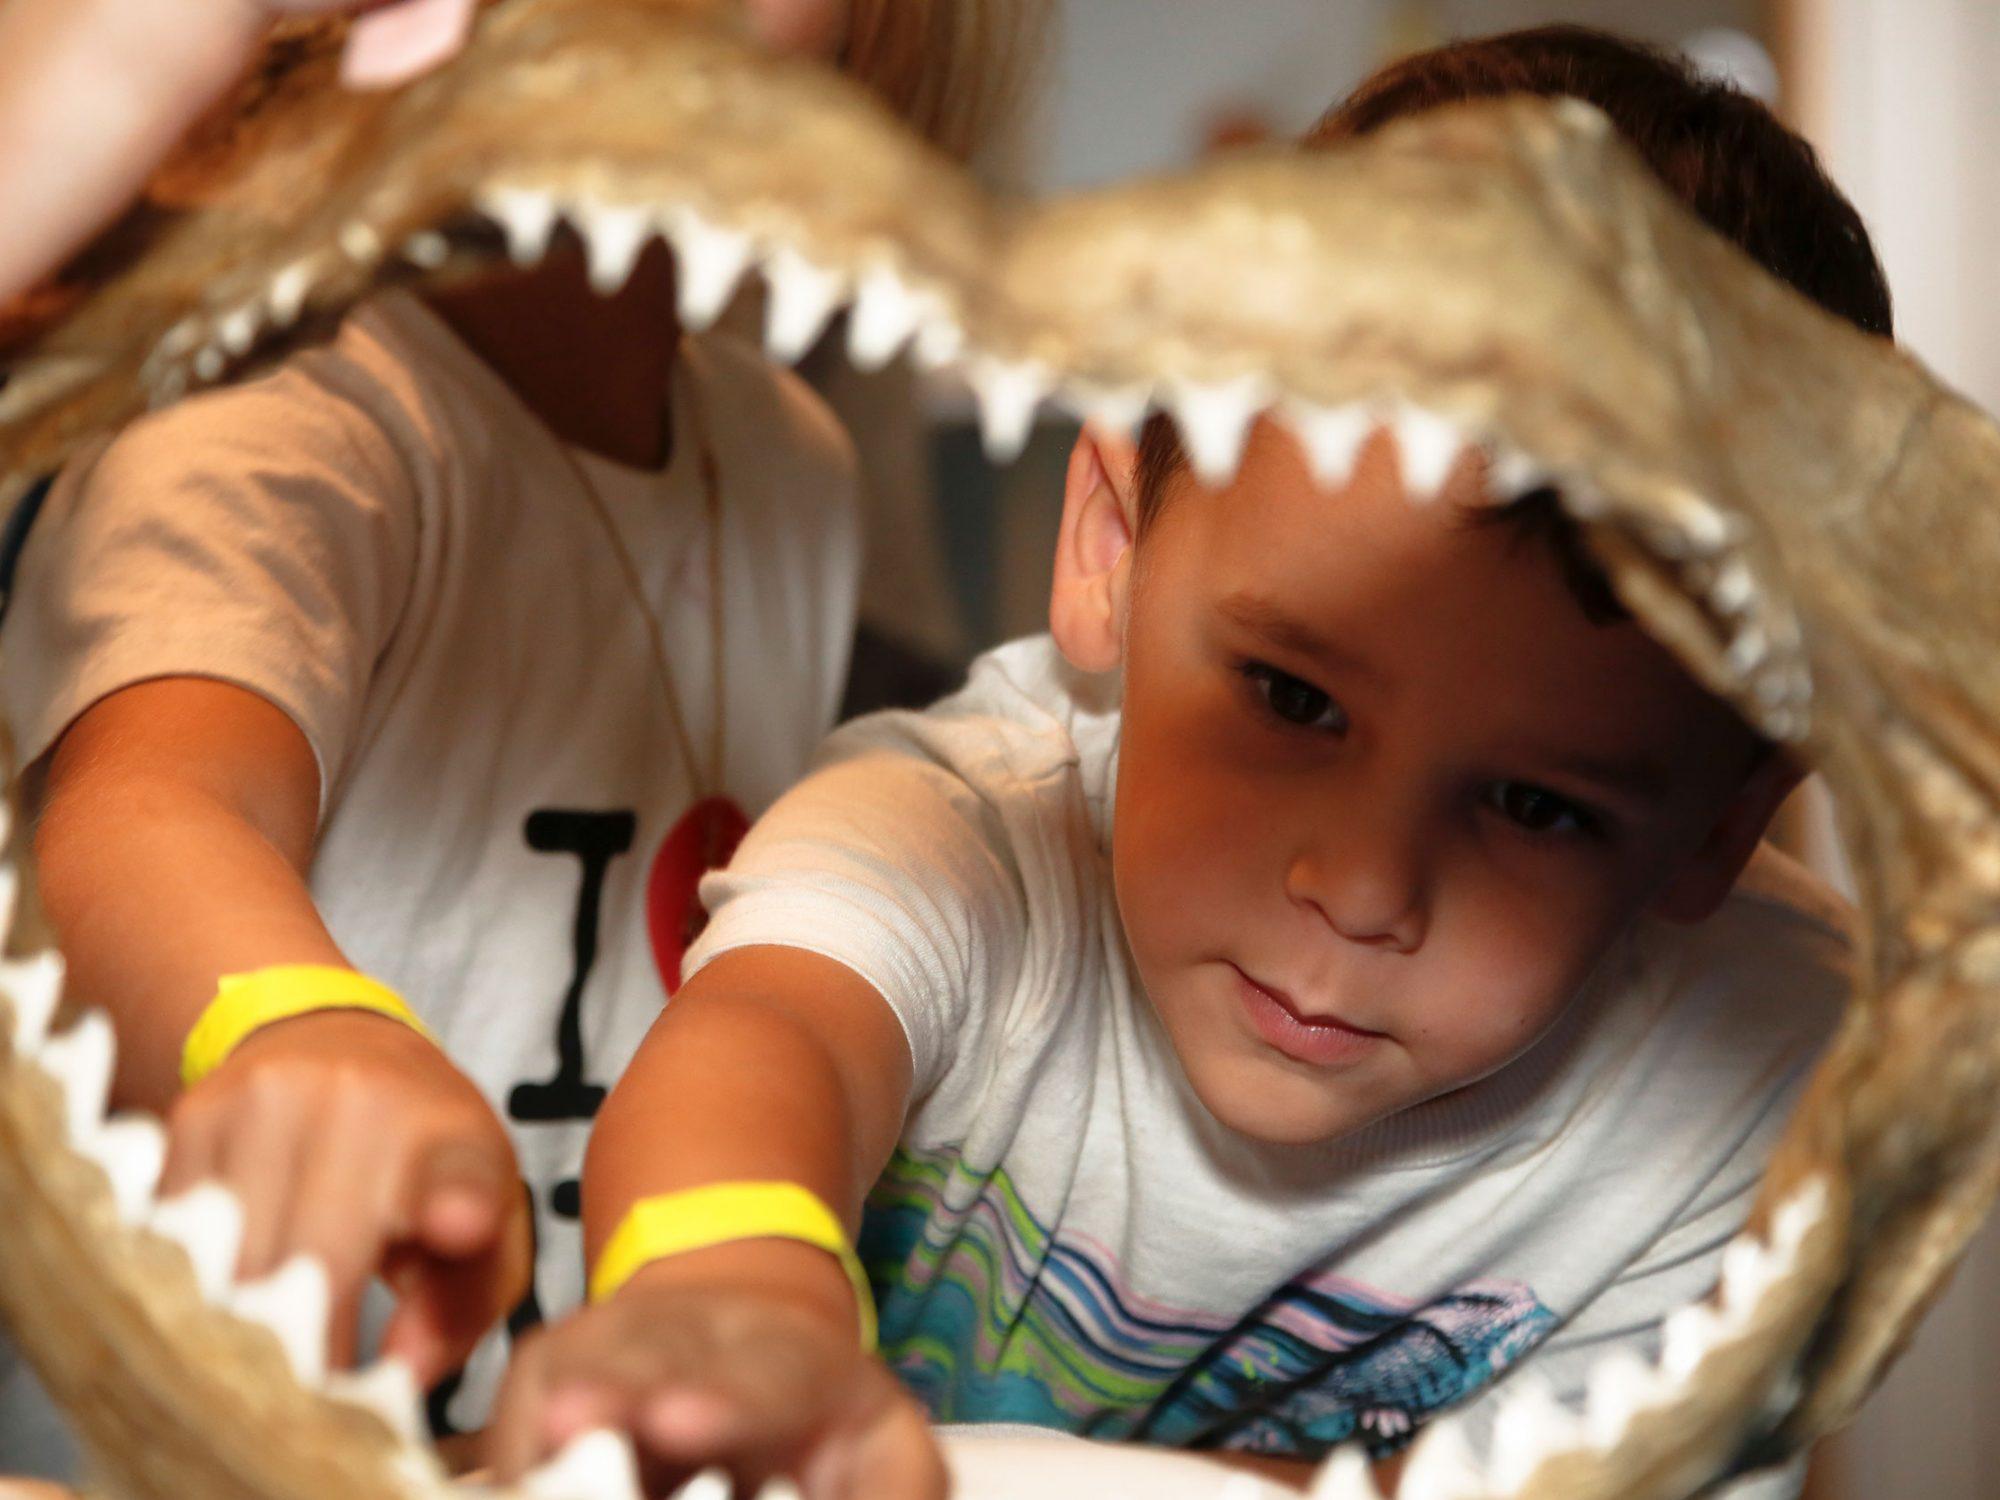 Two children looking through a shark's jaw bone